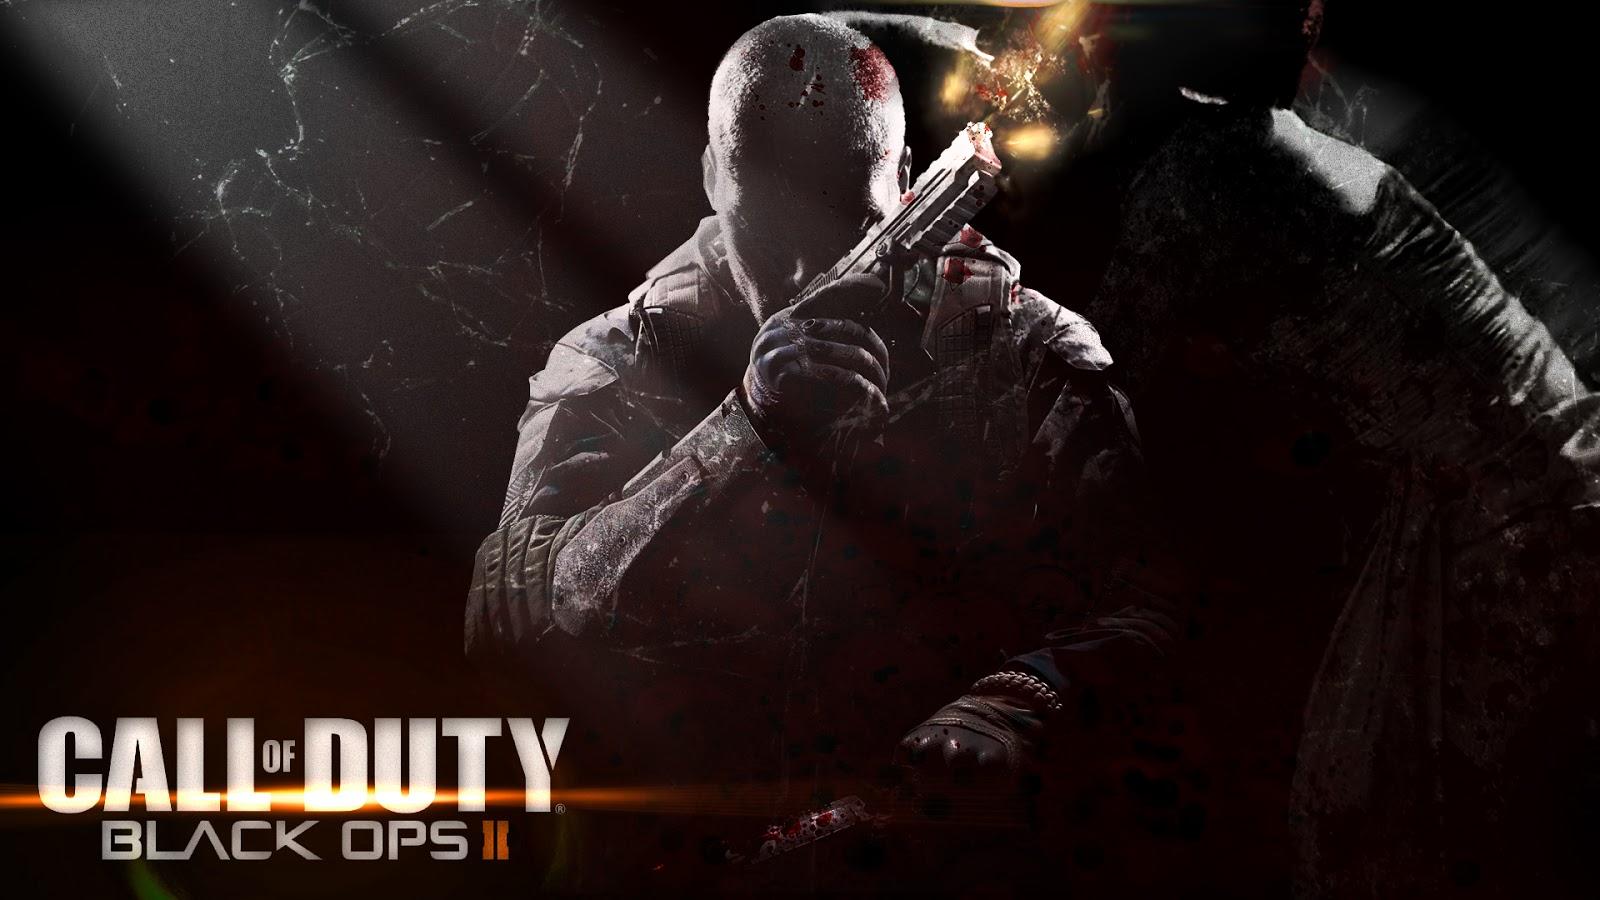 Black Ops 3 Zombie Wallpaper